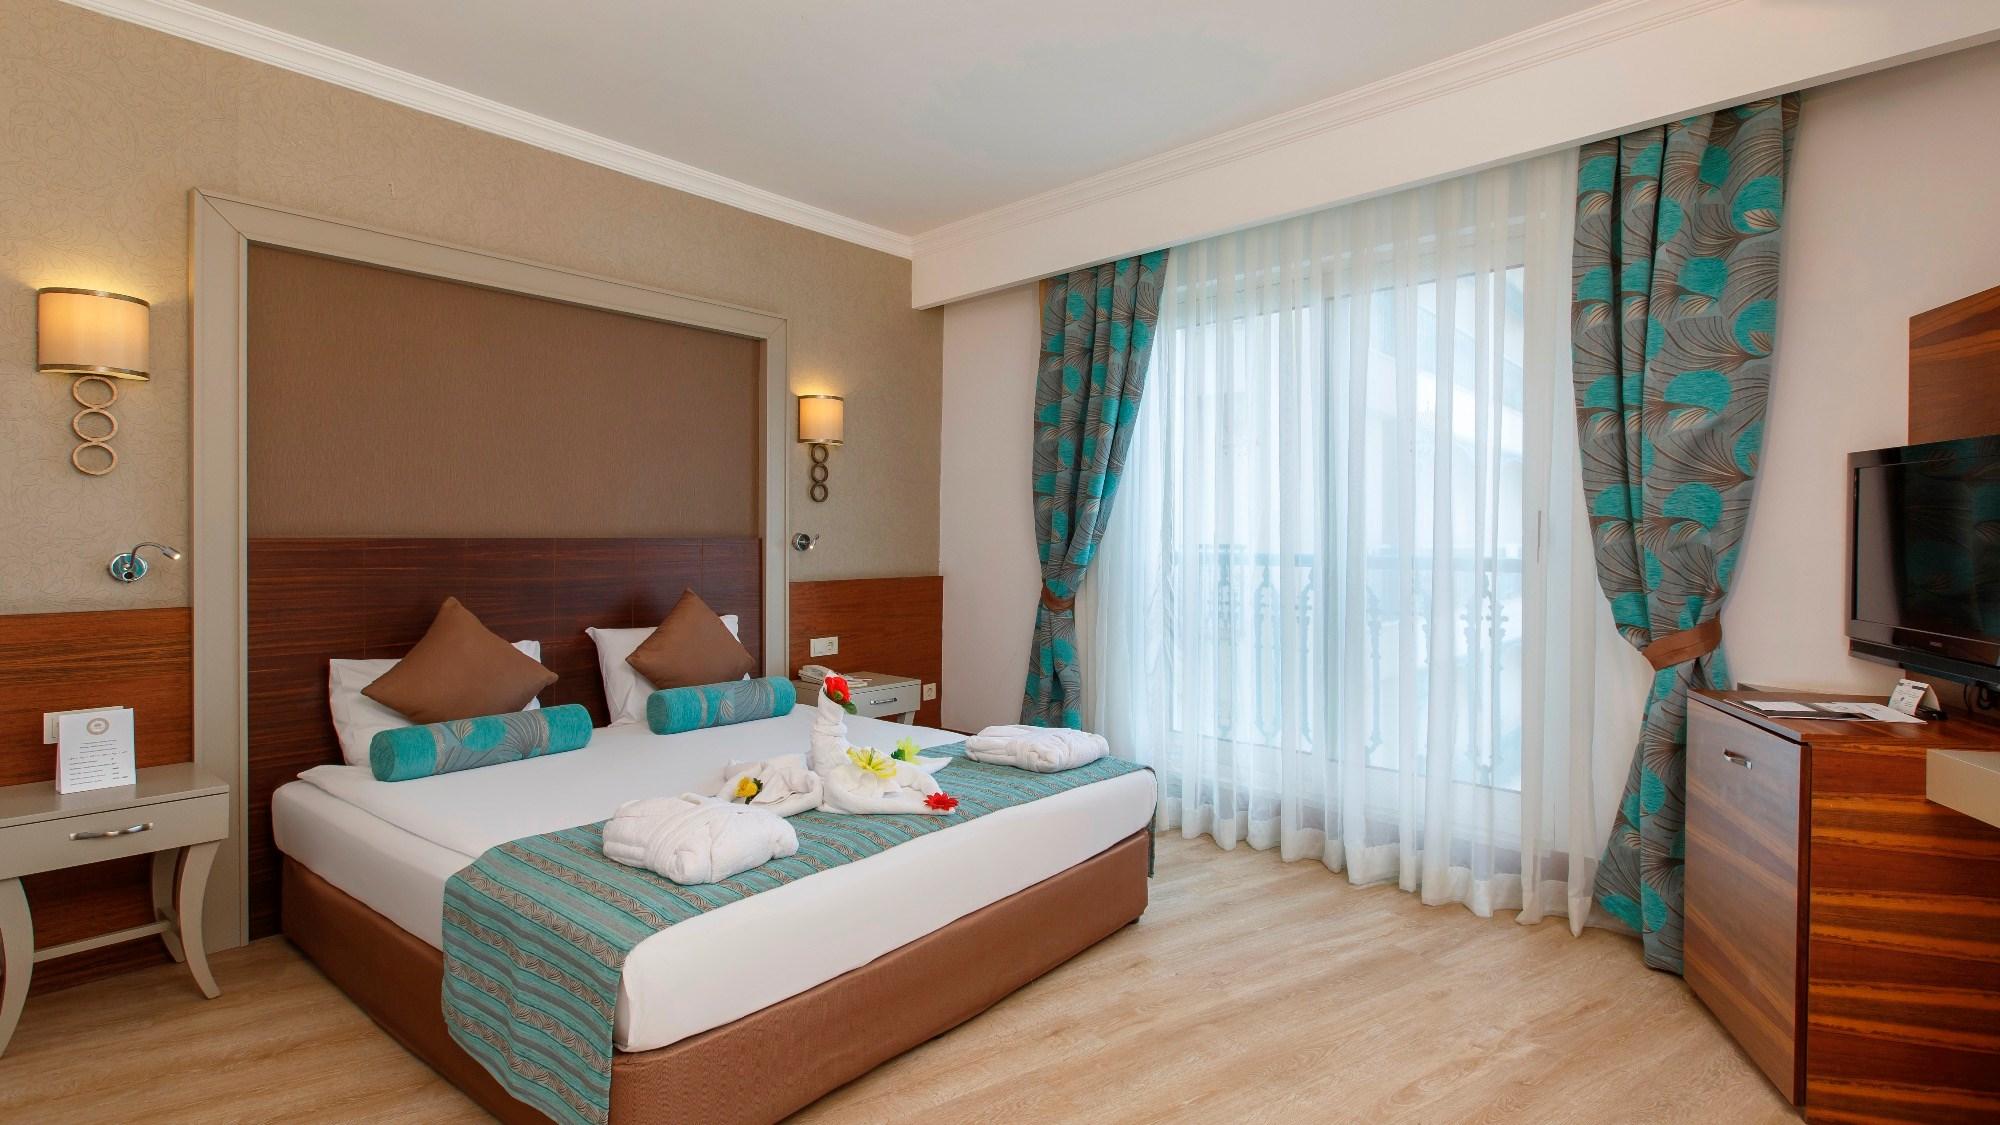 http://www.orextravel.sk/OREX/hotelphotos/side-crown-palace-general-114405.jpg